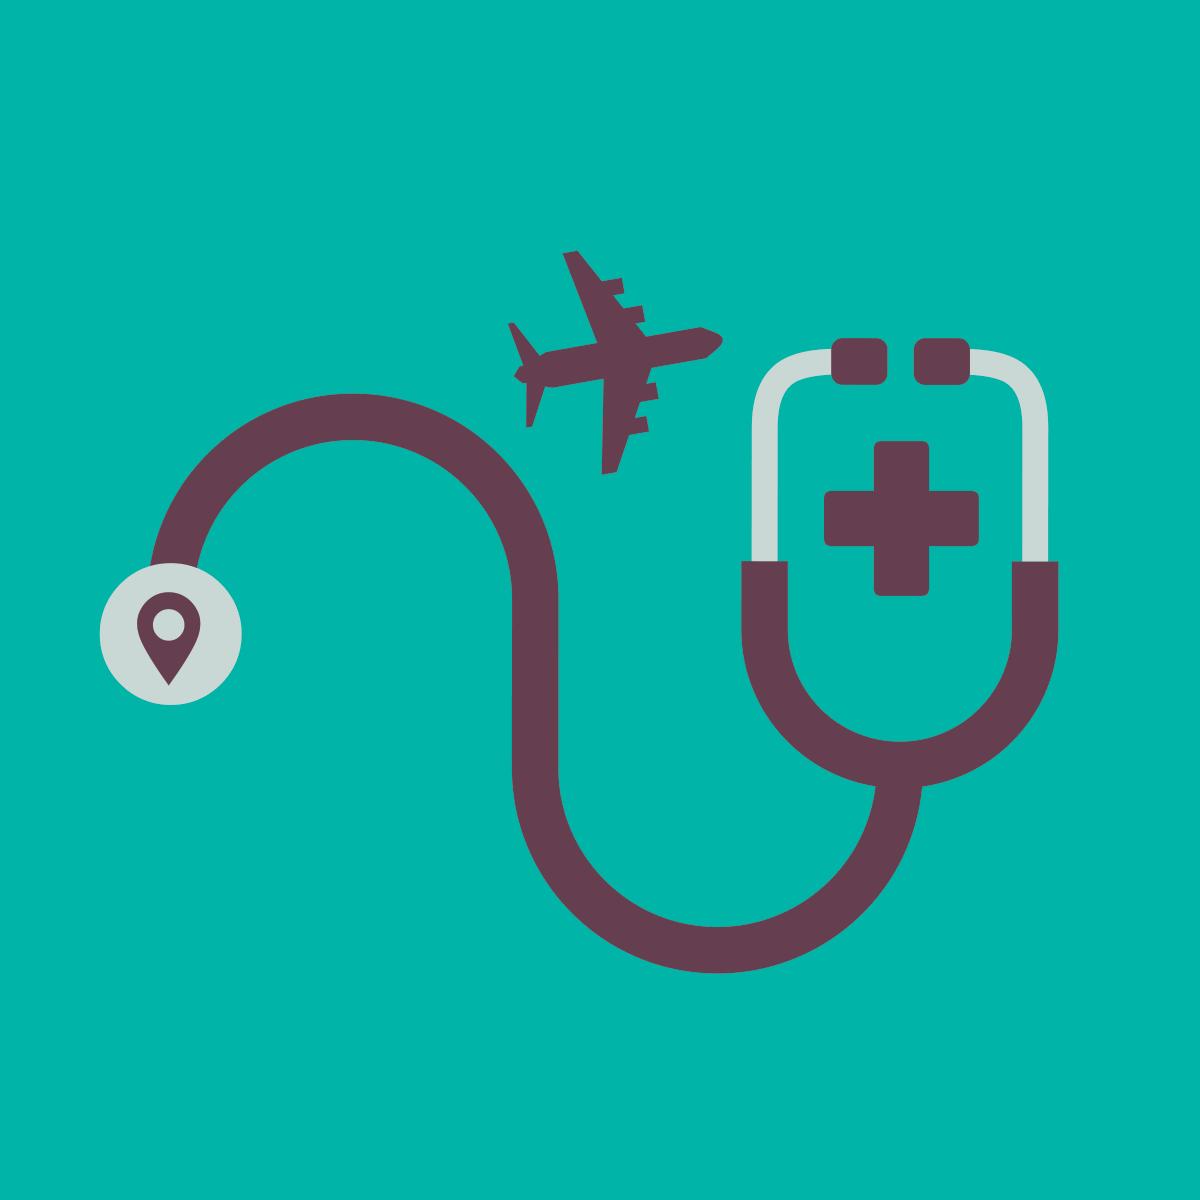 72 medical tourism